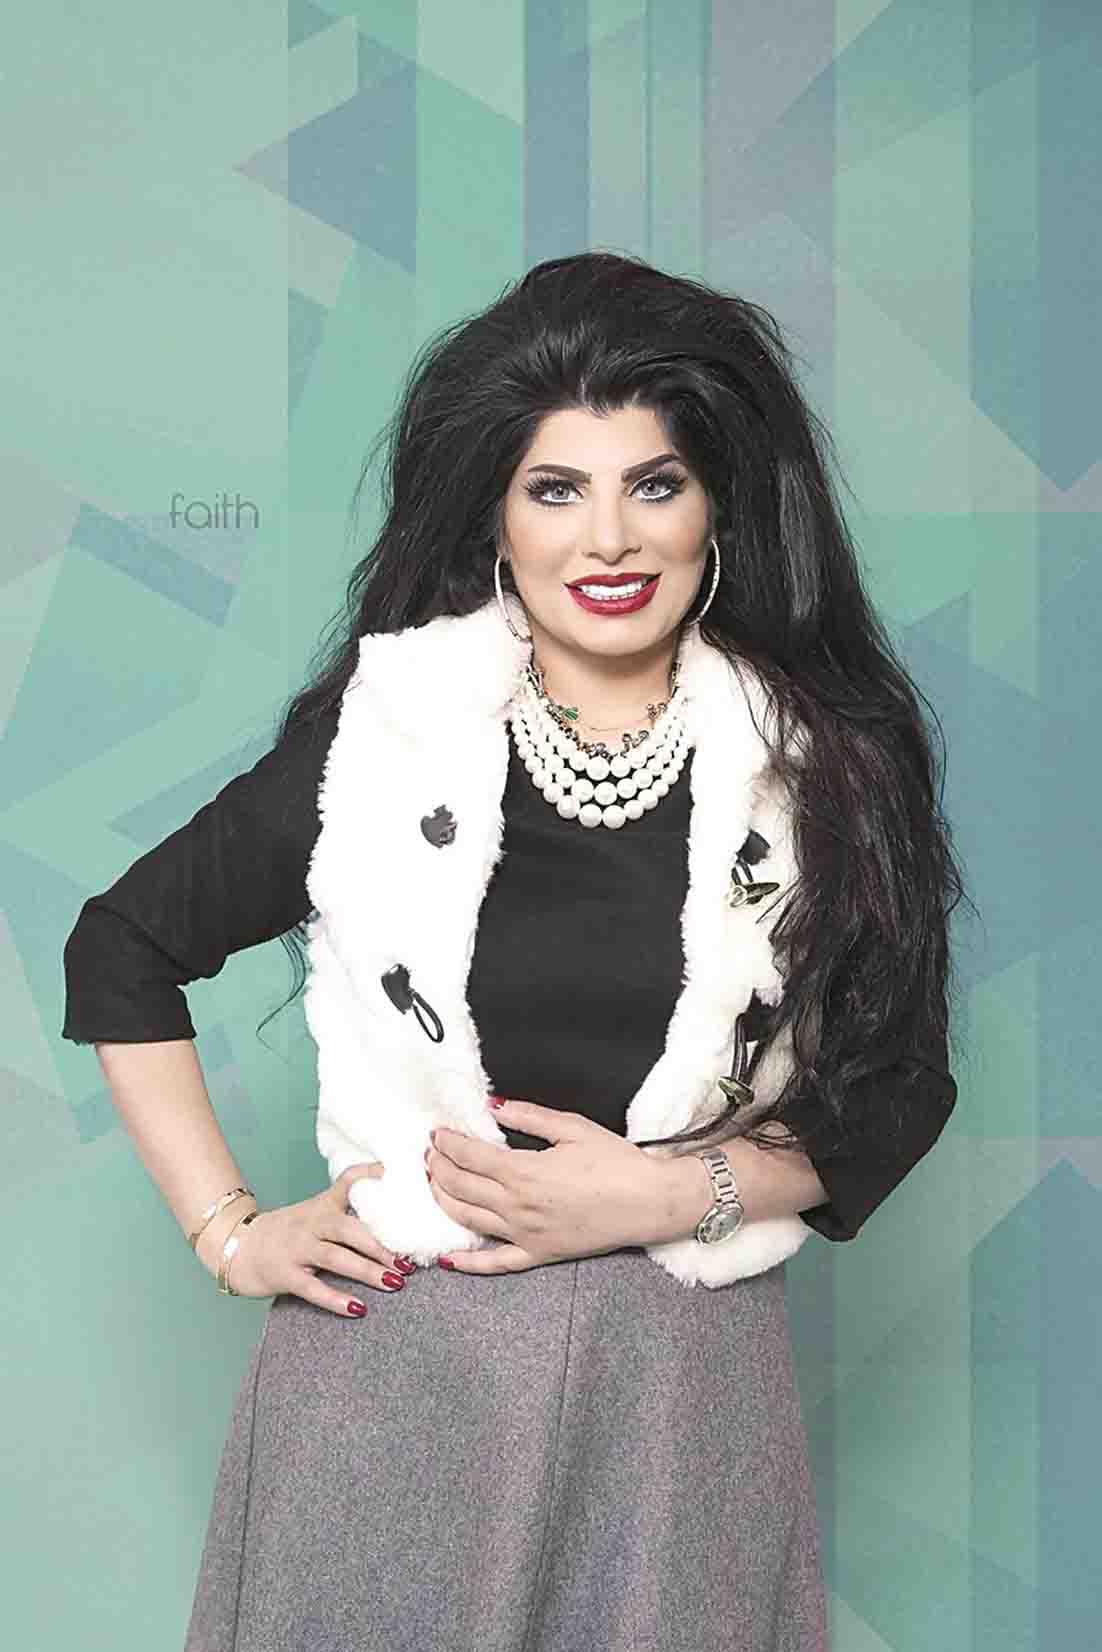 Photo of الكويتية صباح عبادي تشارك في بطولة المسلسل بسورية مو اليوم بكرا